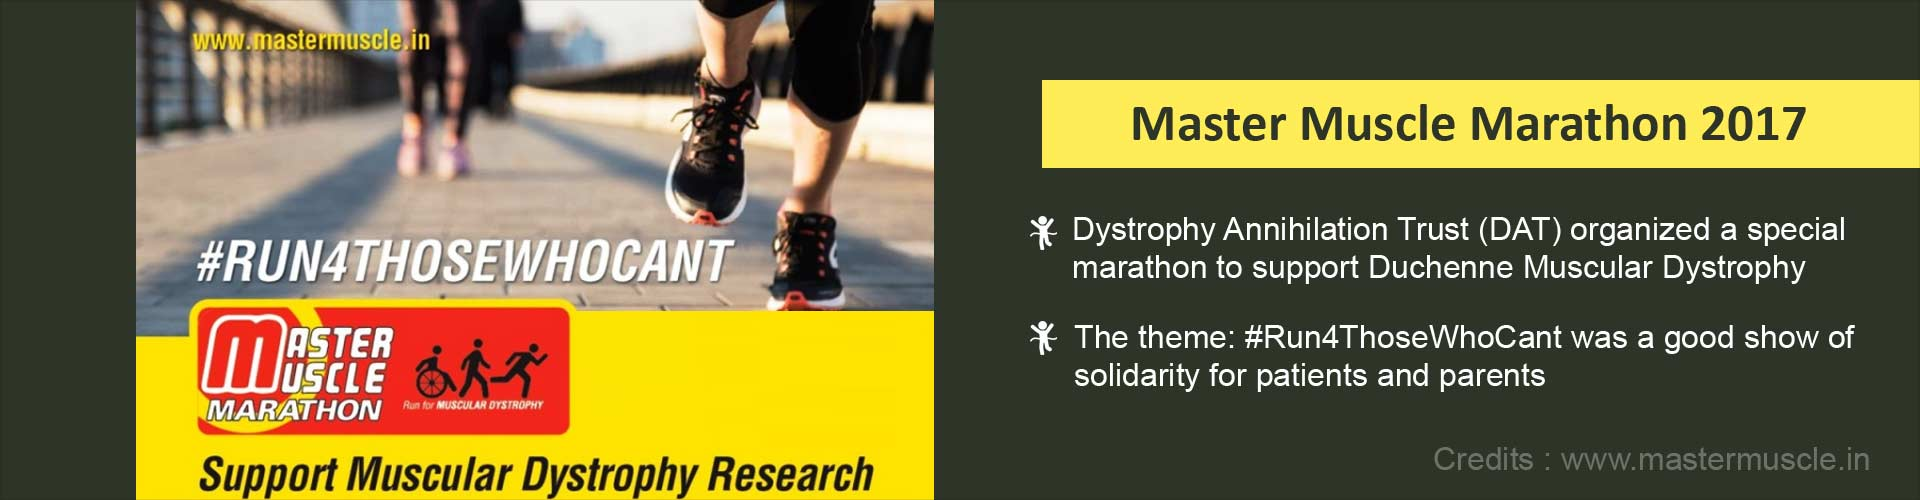 Master Muscle Marathon 2017: Run for Duchenne Muscular Dystrophy